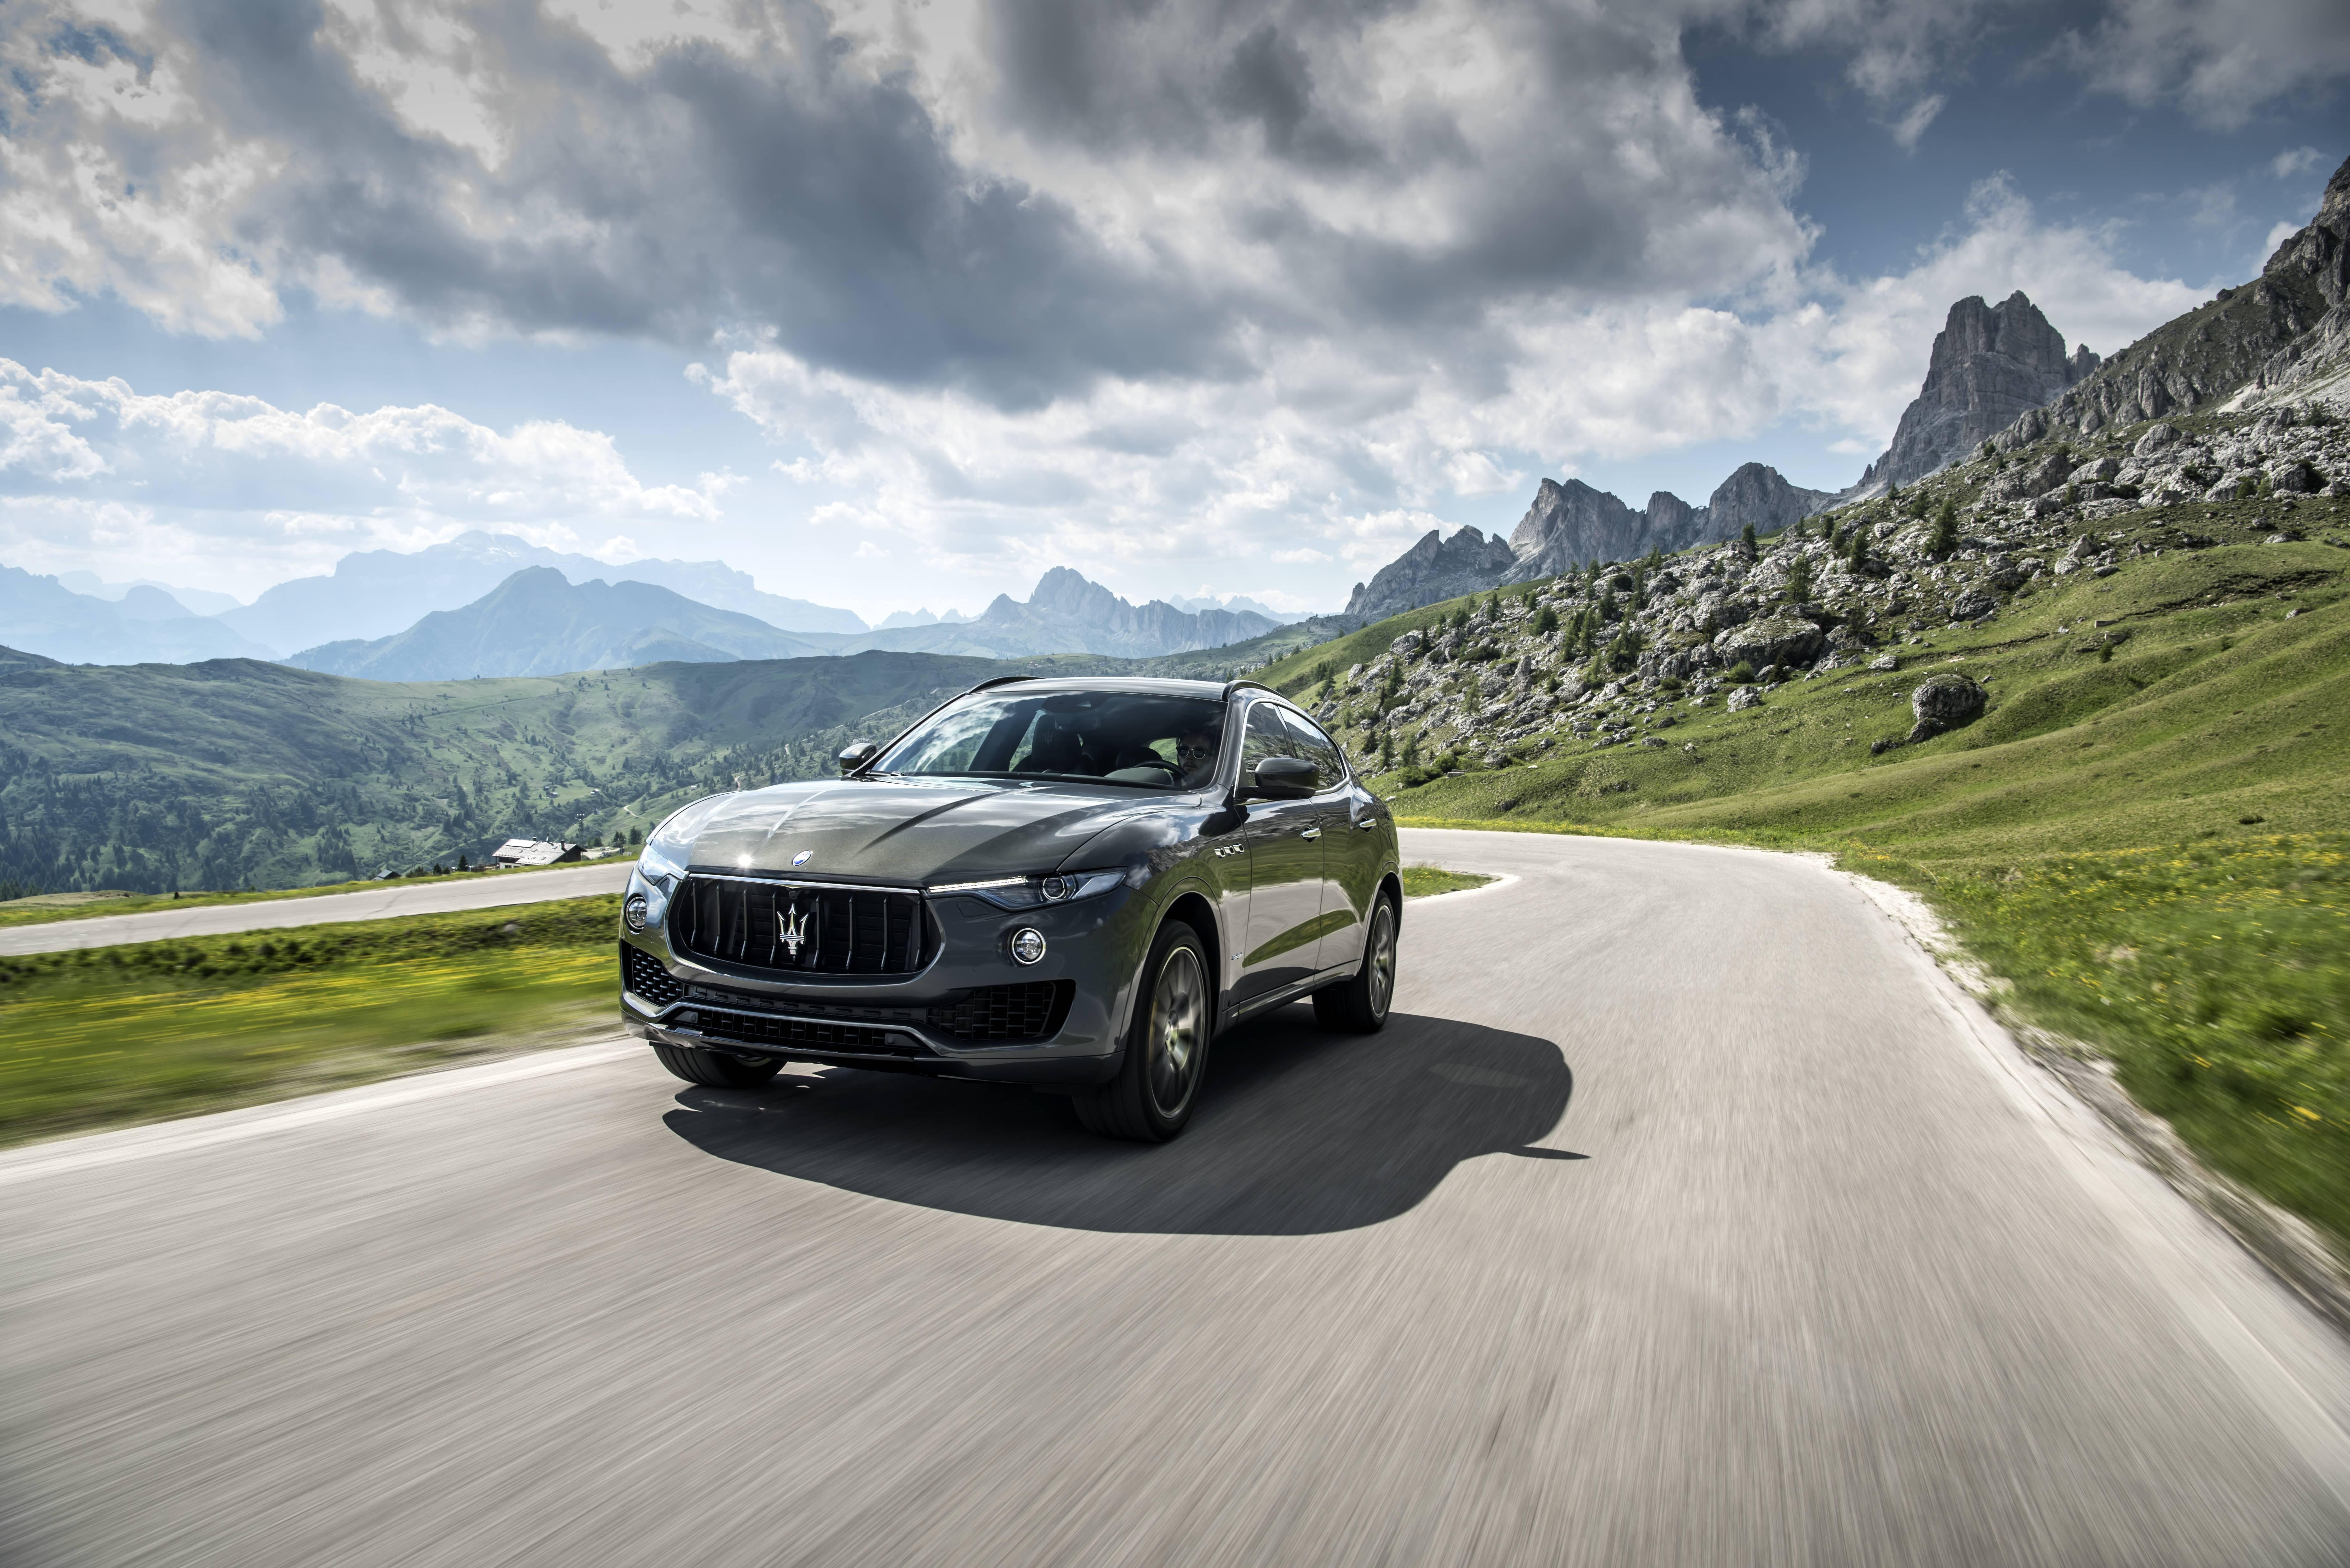 Maserati versterkt Levante-serie met nieuwe 350 pk biturbo benzinemotor